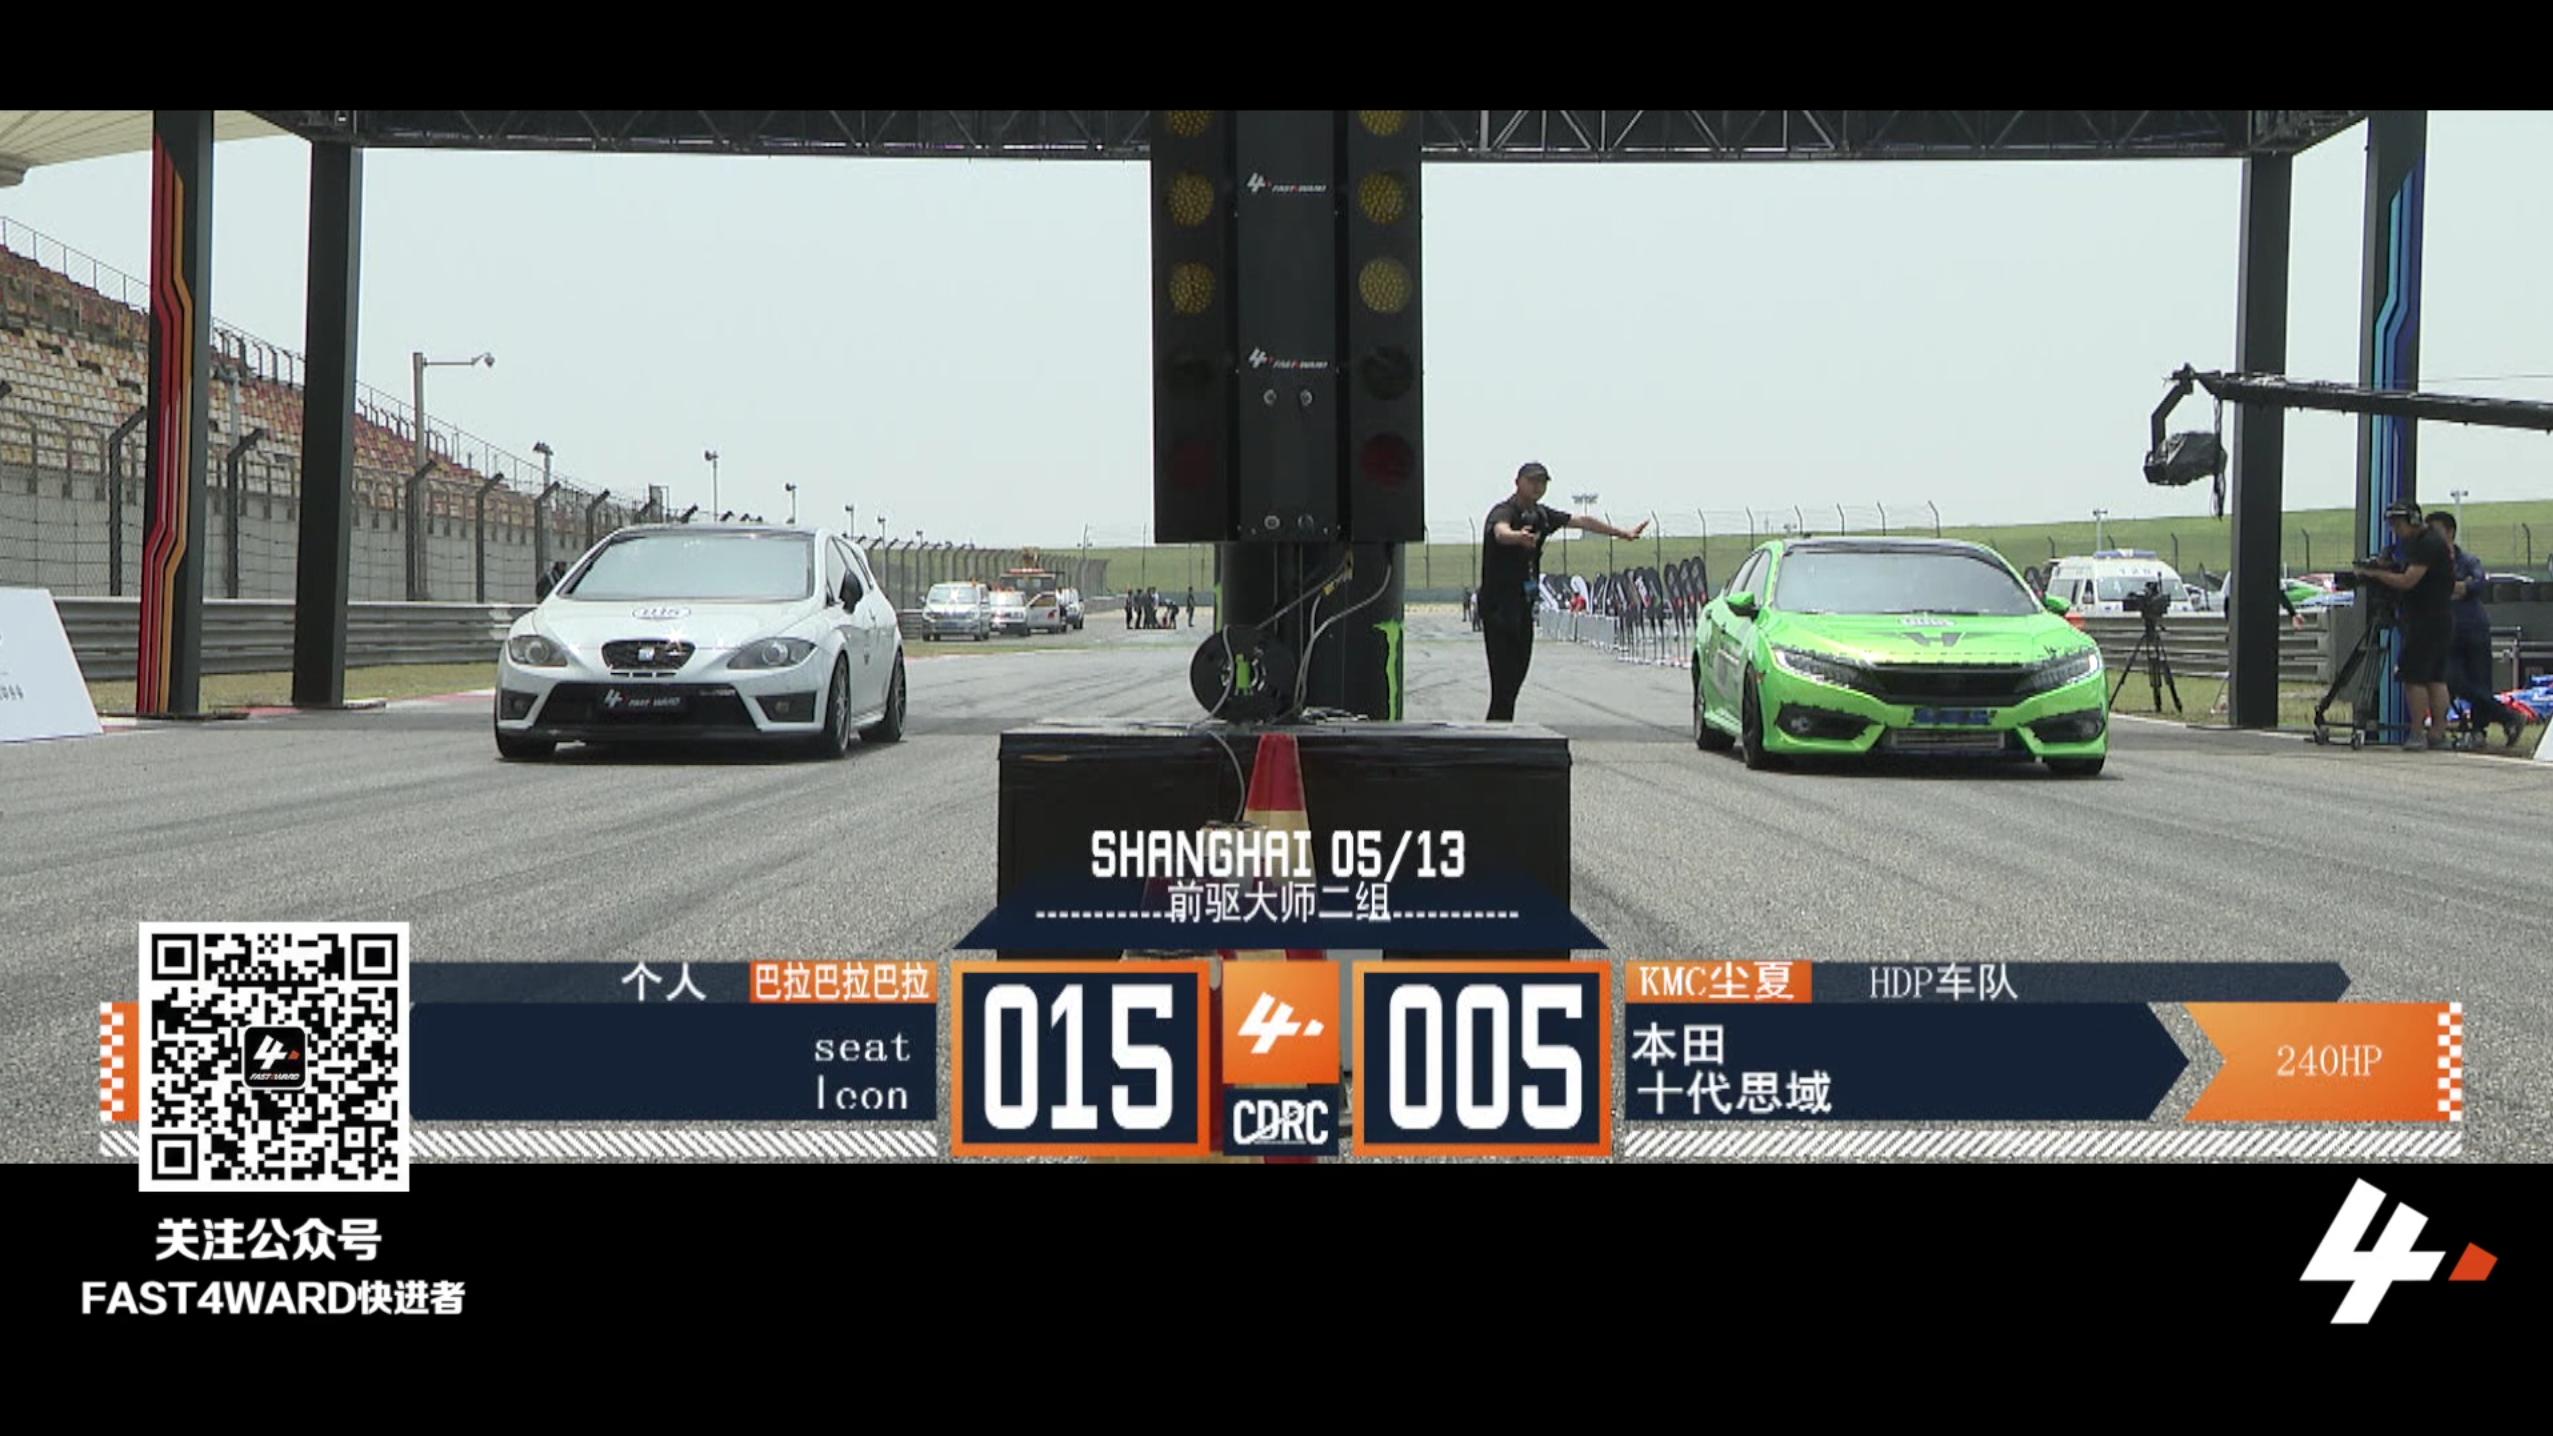 FAST4WARD 上海站 seat lcon vs 本田十代思域